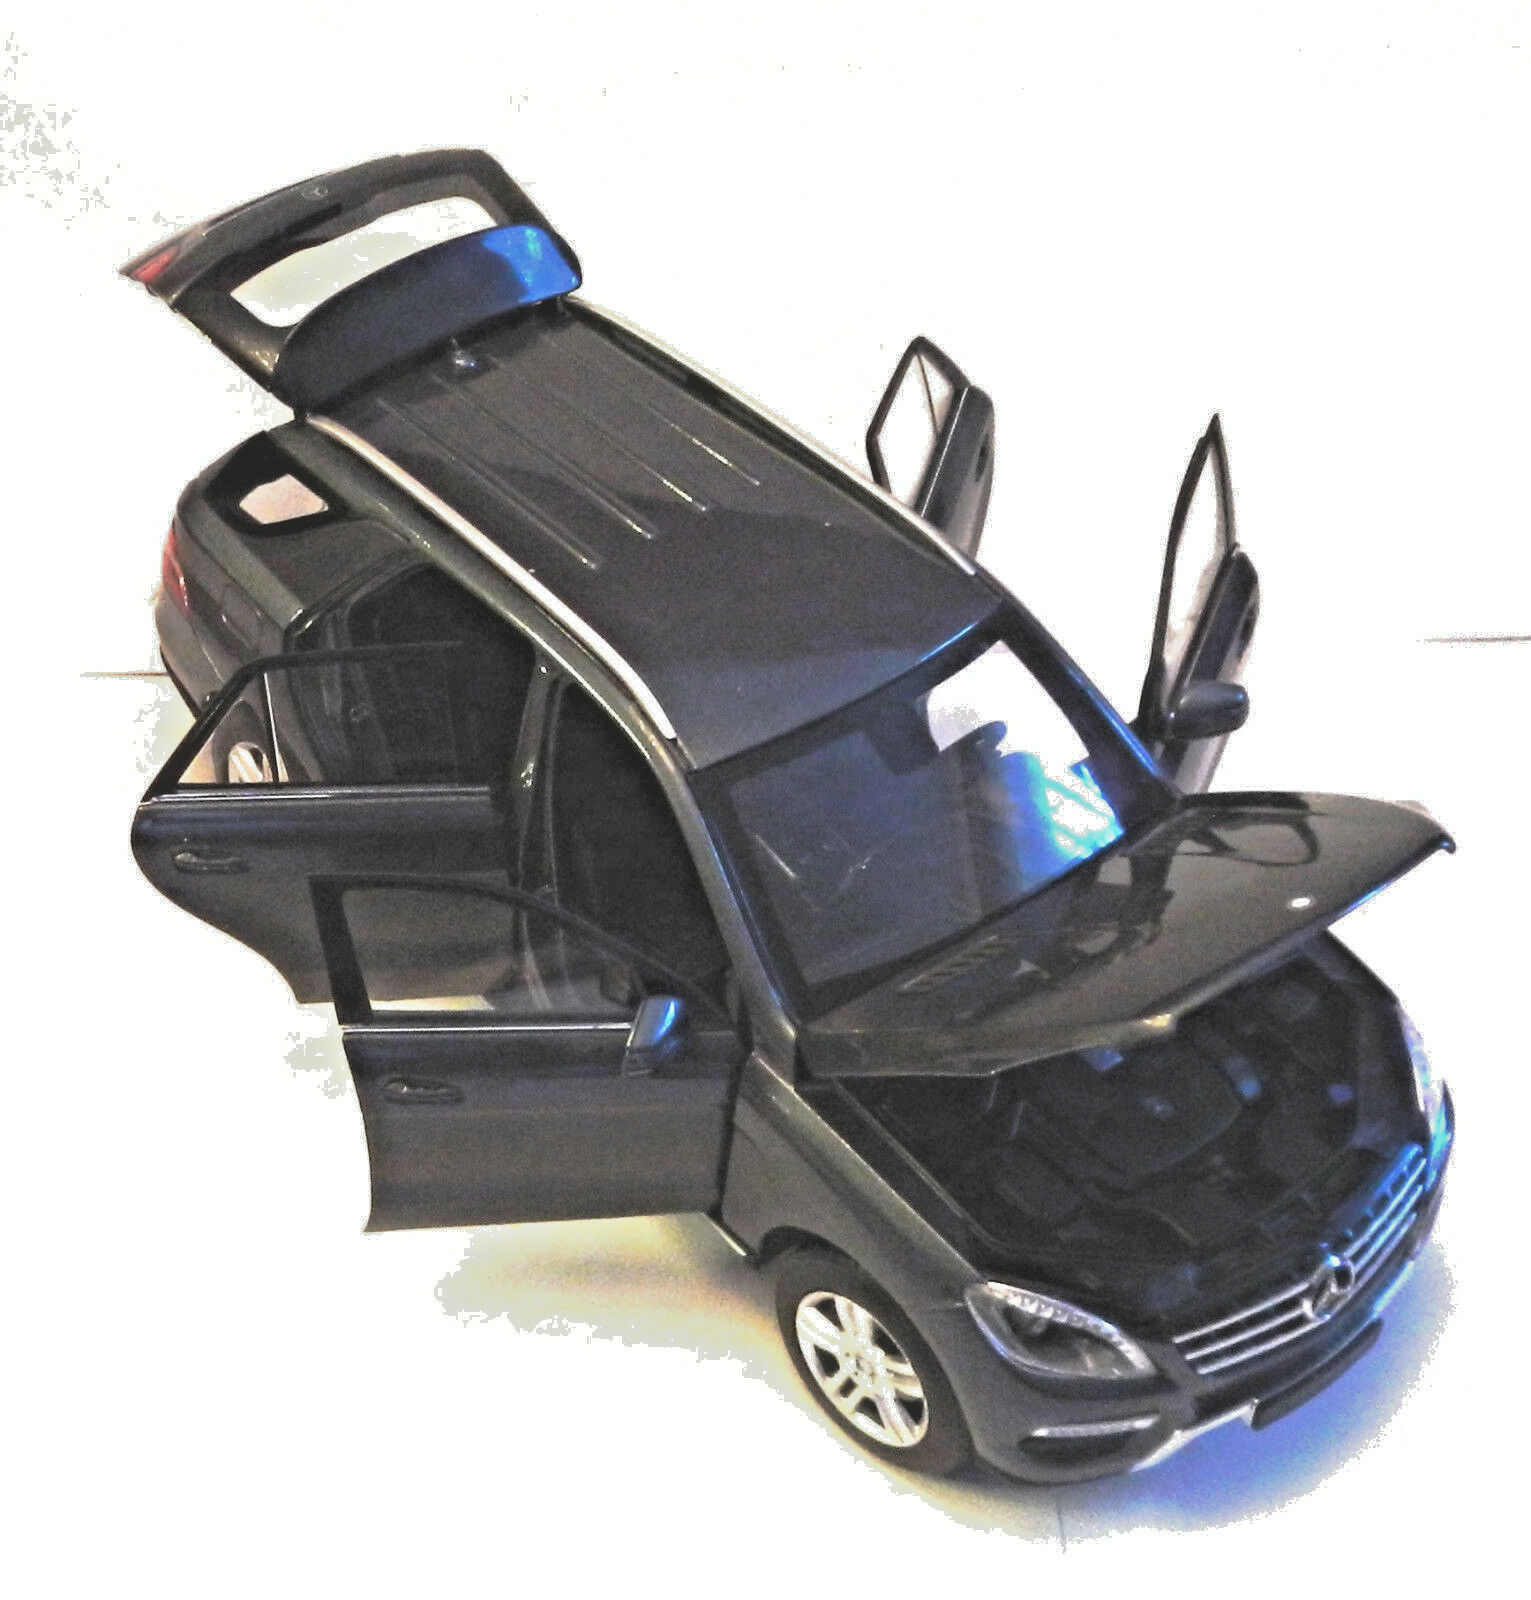 MINICHAMPS Mercedes Benz M-Klasse 2011, 1 18, mint